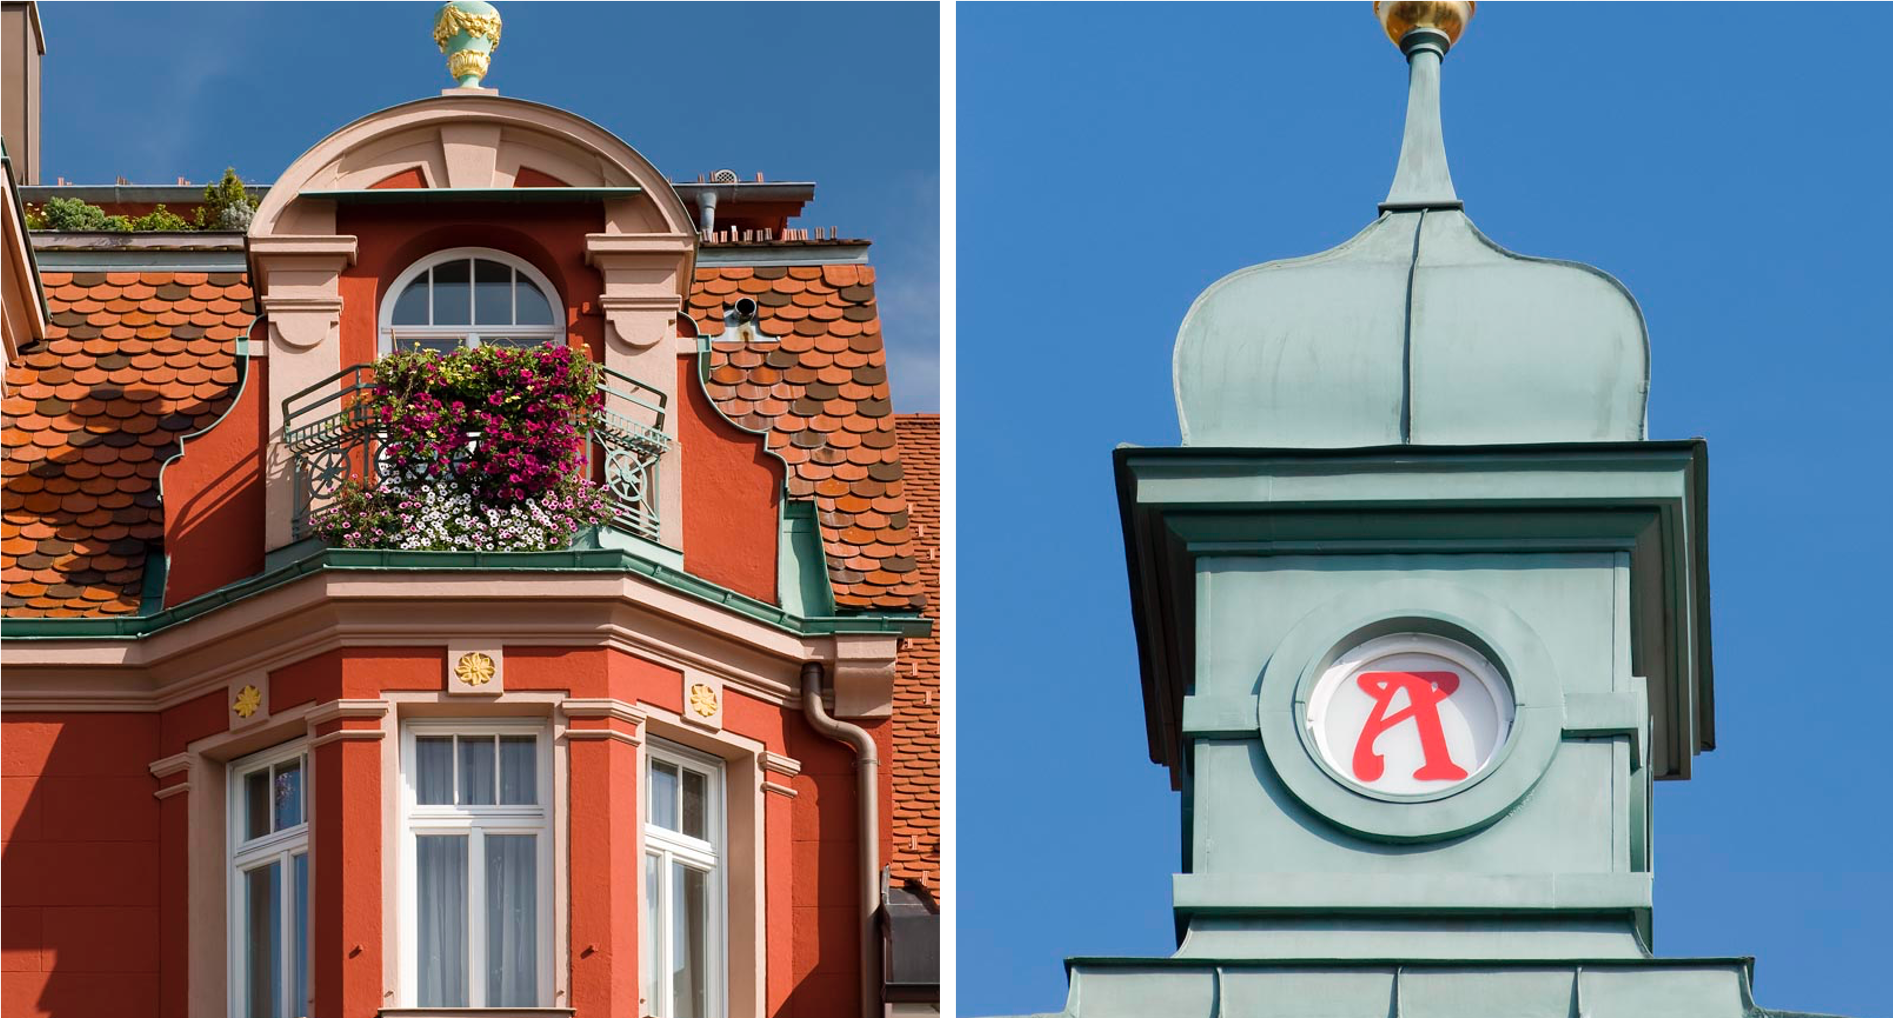 Apotheke Haus mit Turm und Balkon Bild 4